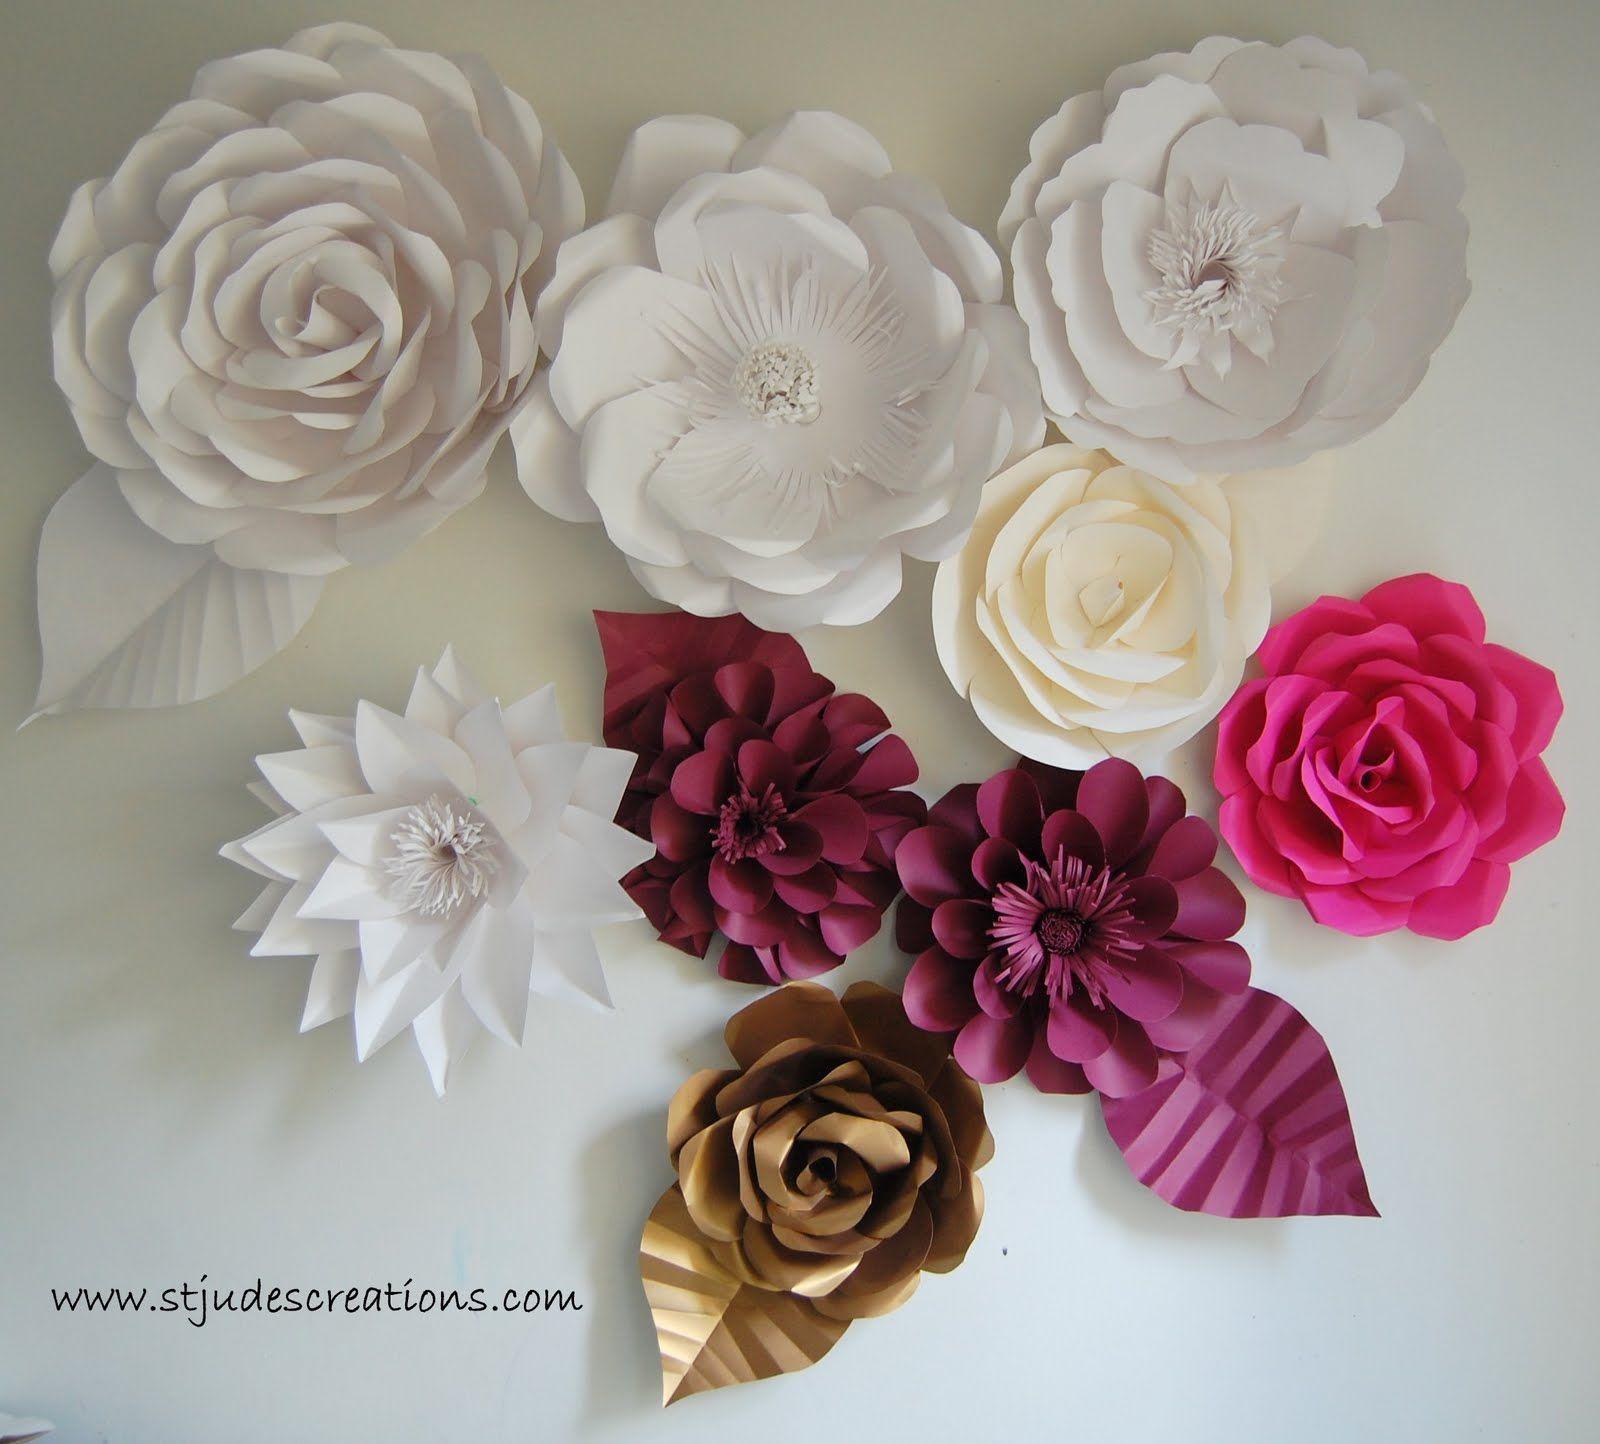 Oversized Paper Flowers Pinterest Flowers Tutorials And Flower